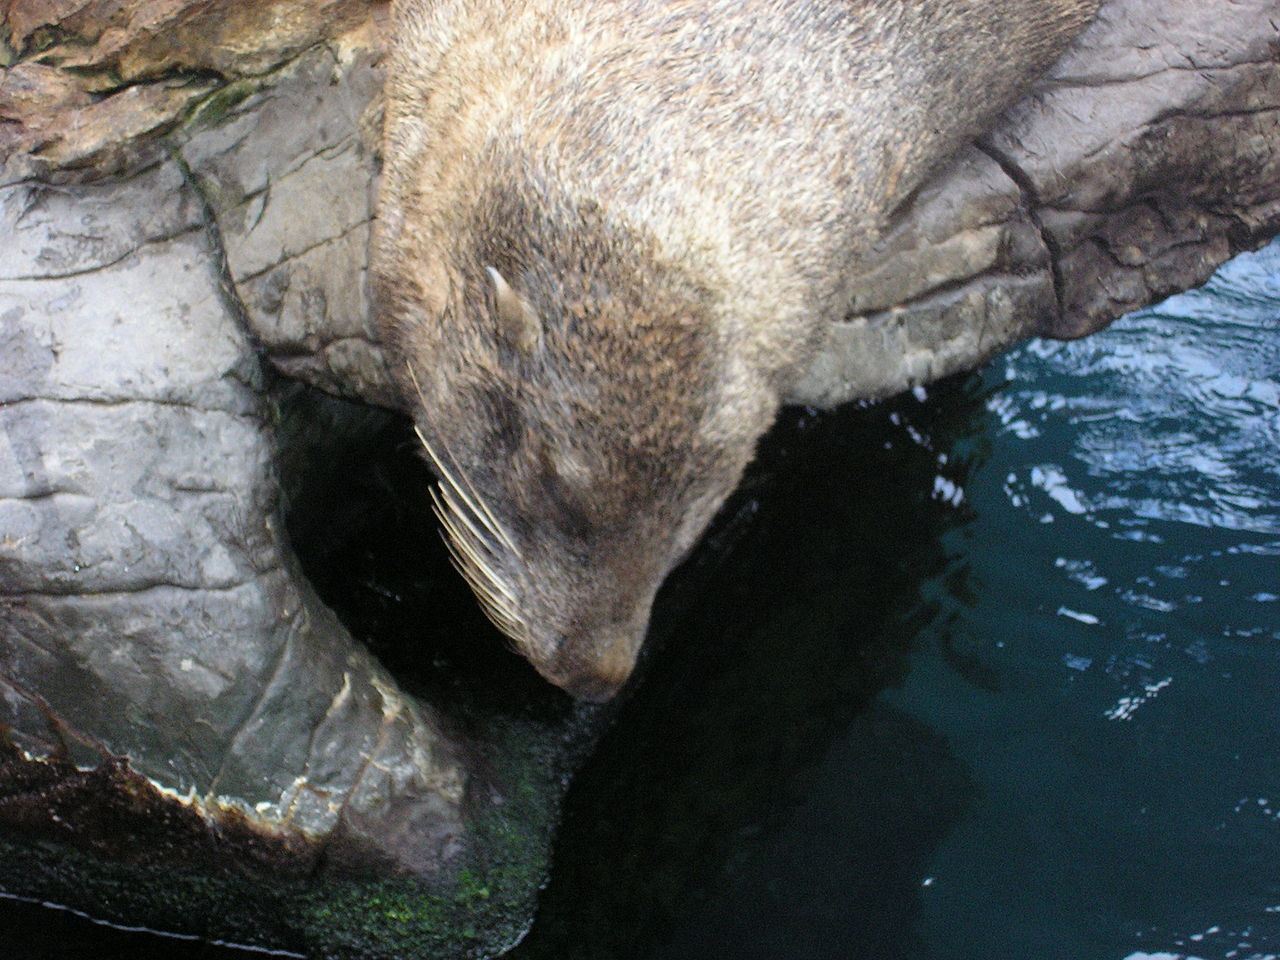 A fur seal sunbathing on a rock at Living Coats, a coastal zoo in Torquay, Devon, England.